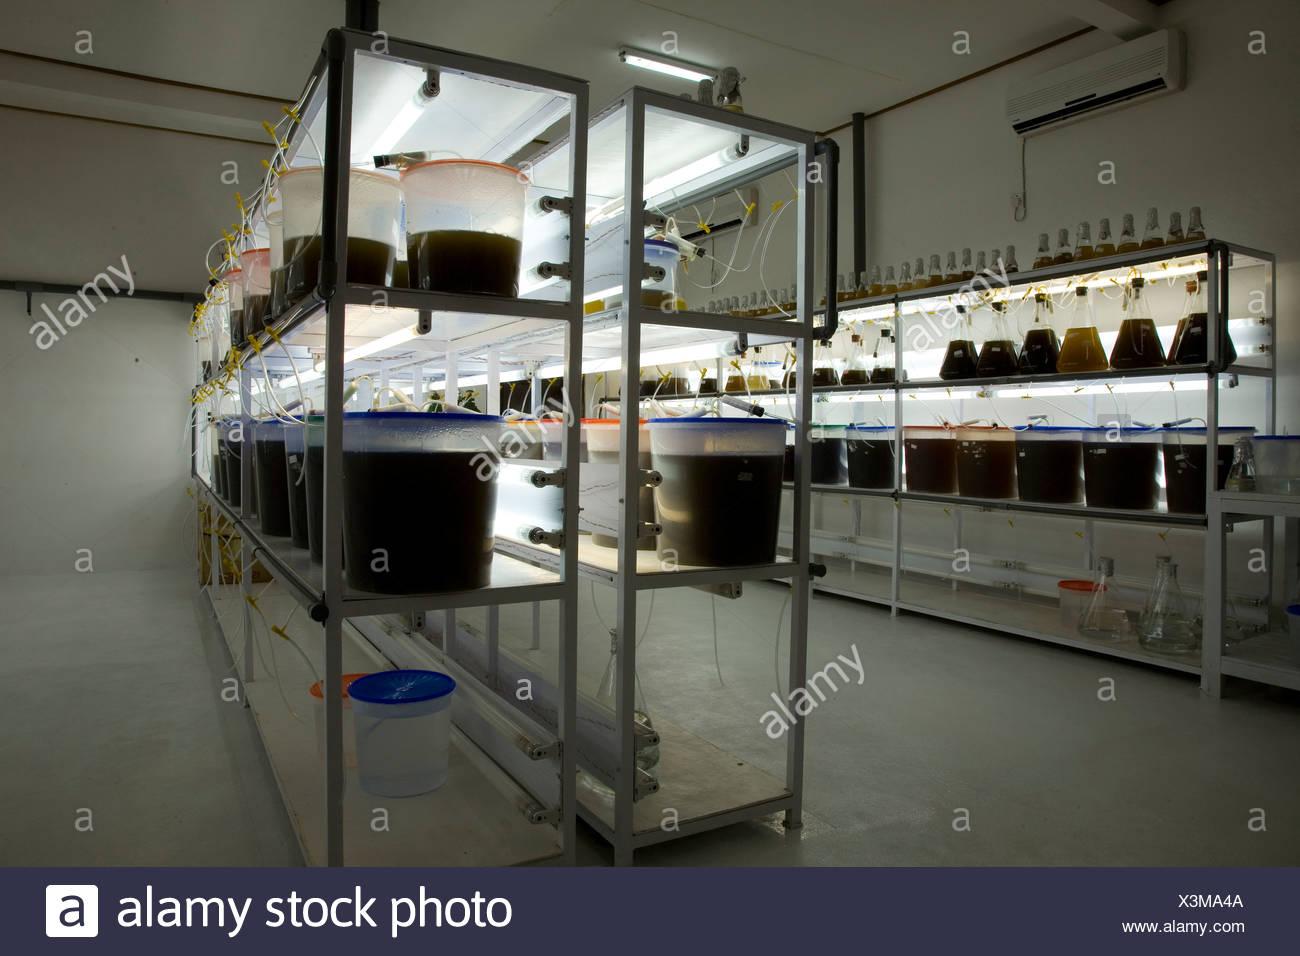 Indonesia laboratory stock photos indonesia laboratory stock